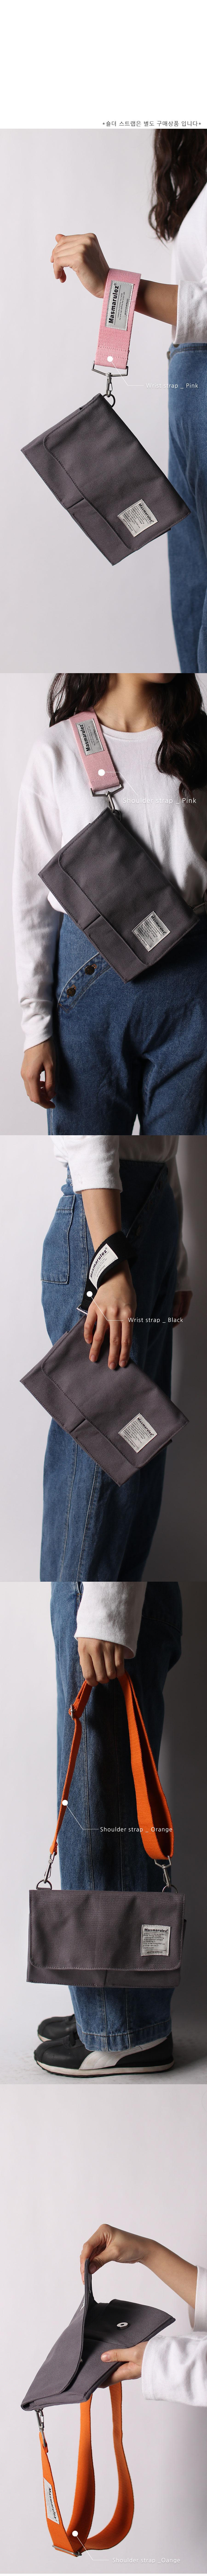 s-mini-pocket-gray-3.jpg